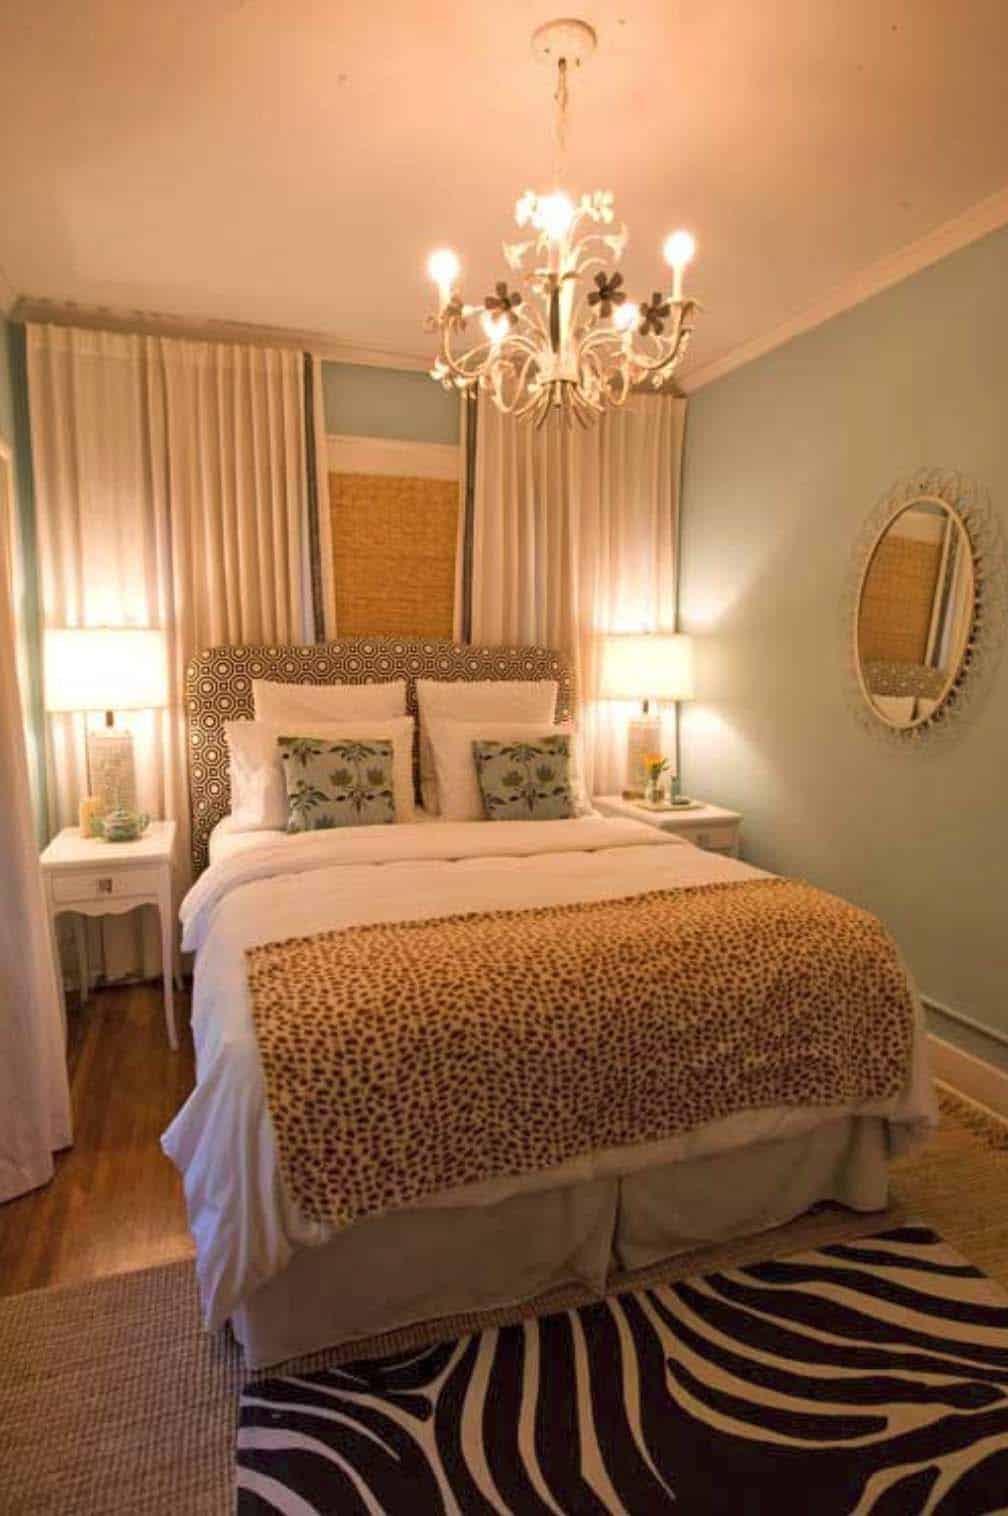 30+ Small yet amazingly cozy master bedroom retreats on Small Room Decoration  id=63065